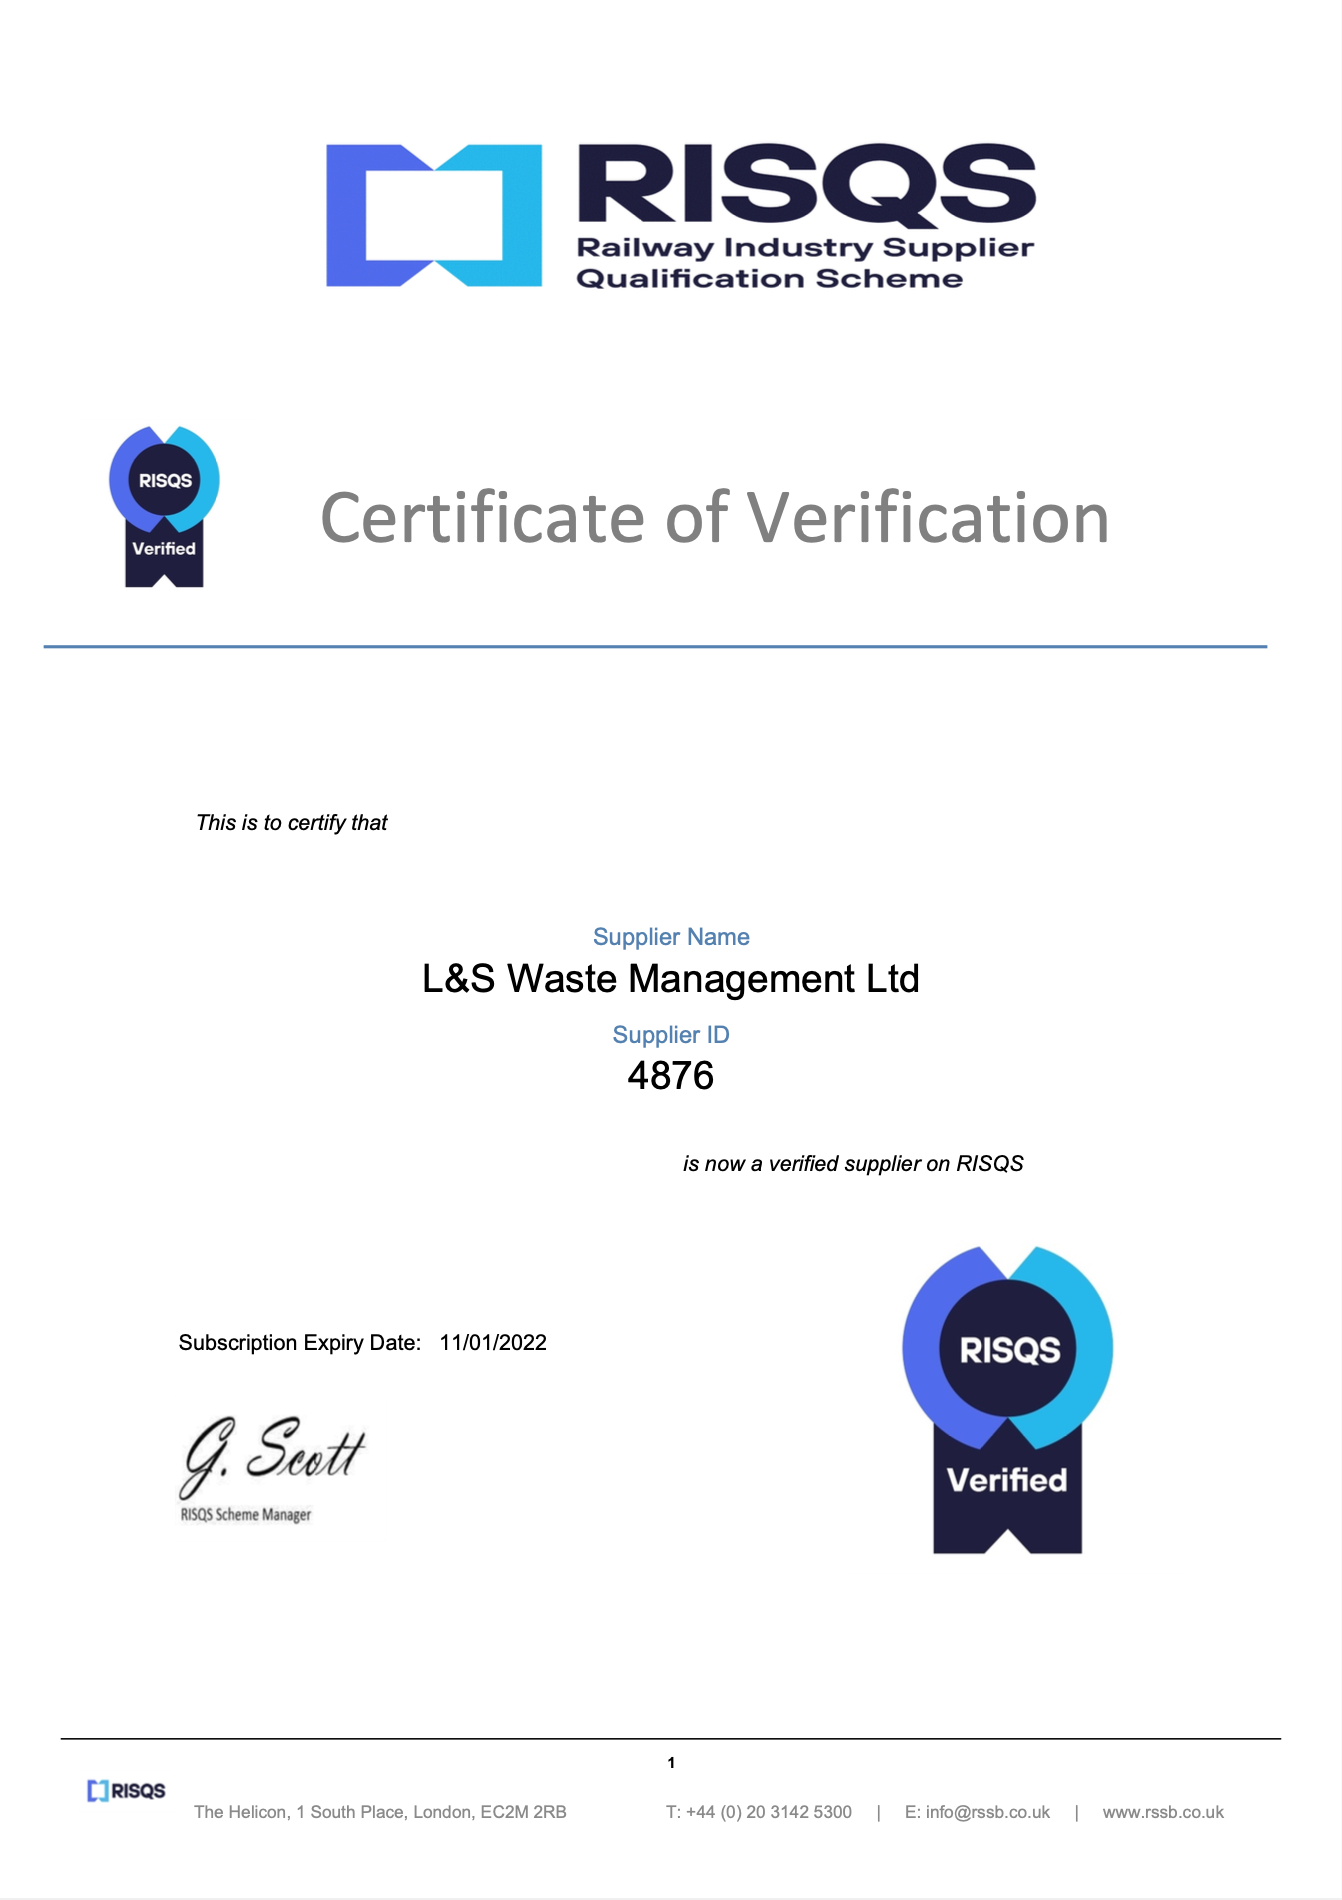 L&S Waste Management - RISQS Certificate